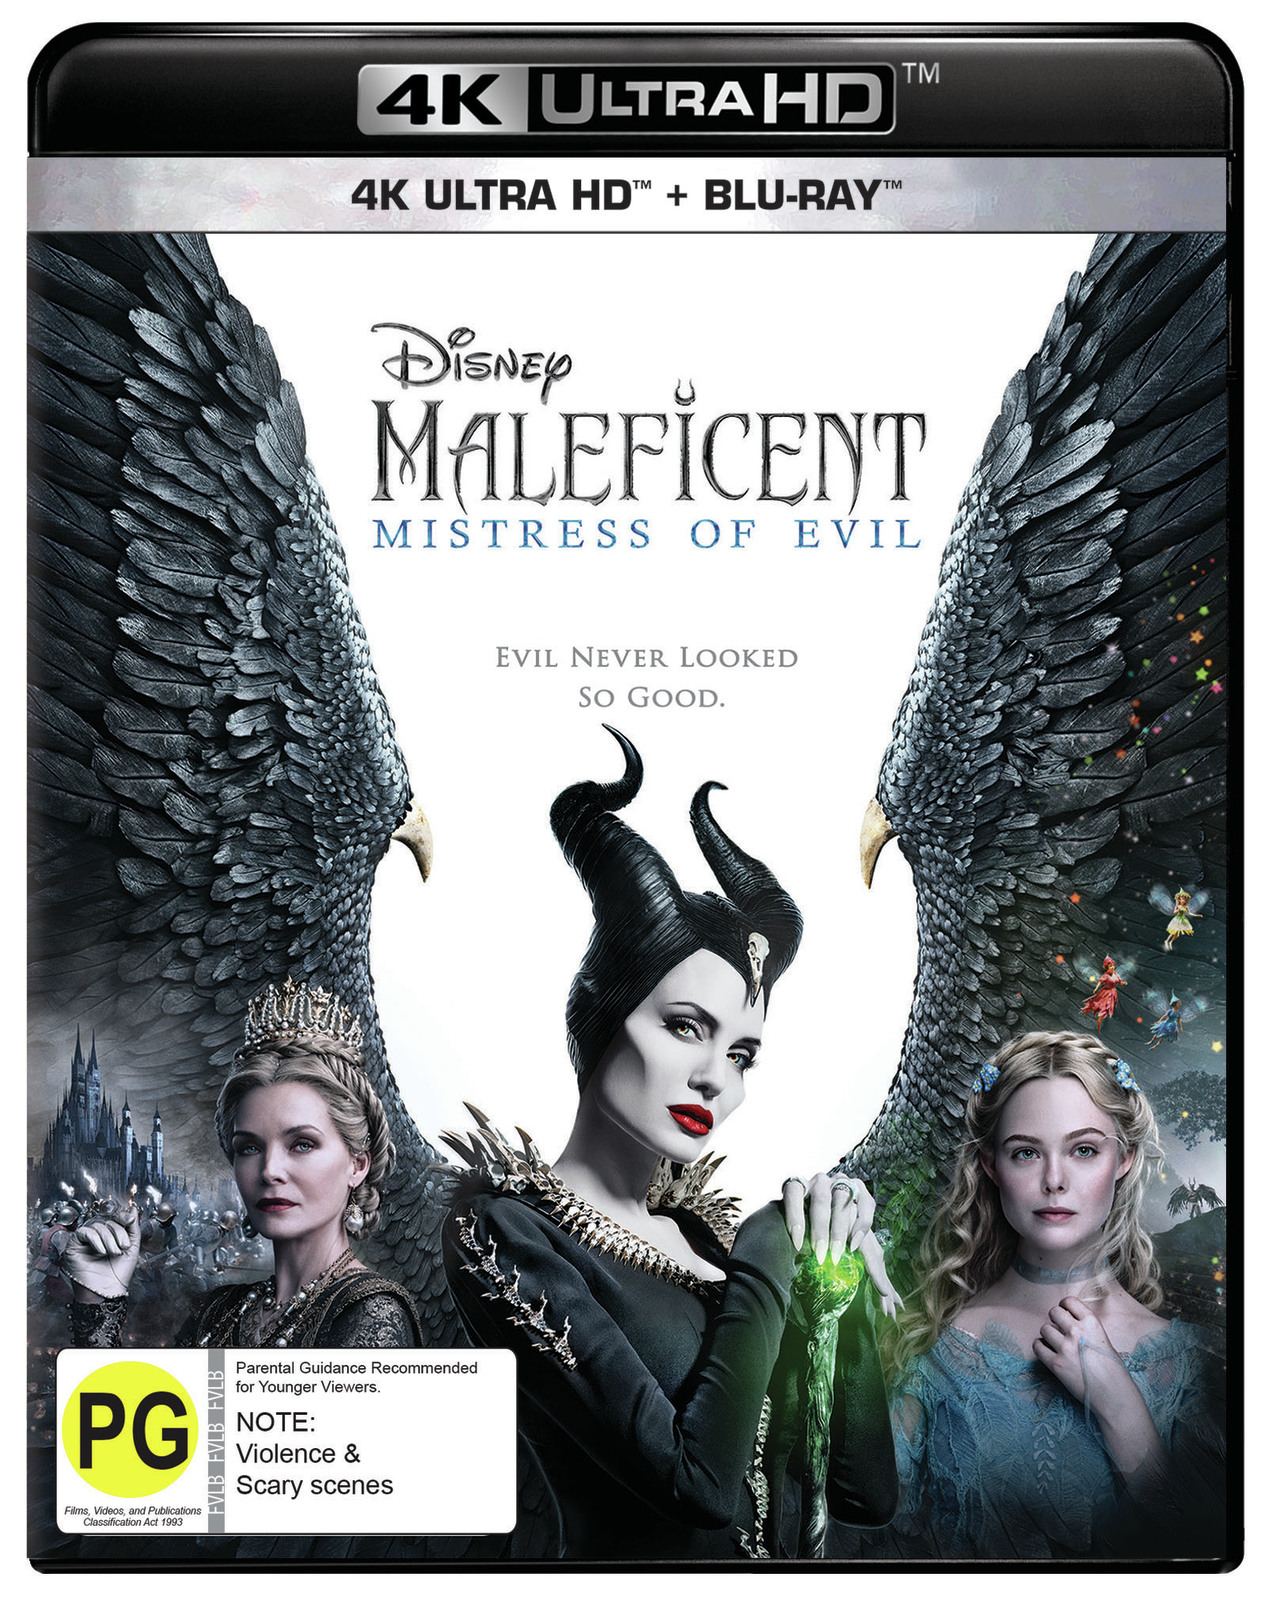 Maleficent: Mistress of Evil (4K UHD) on UHD Blu-ray image